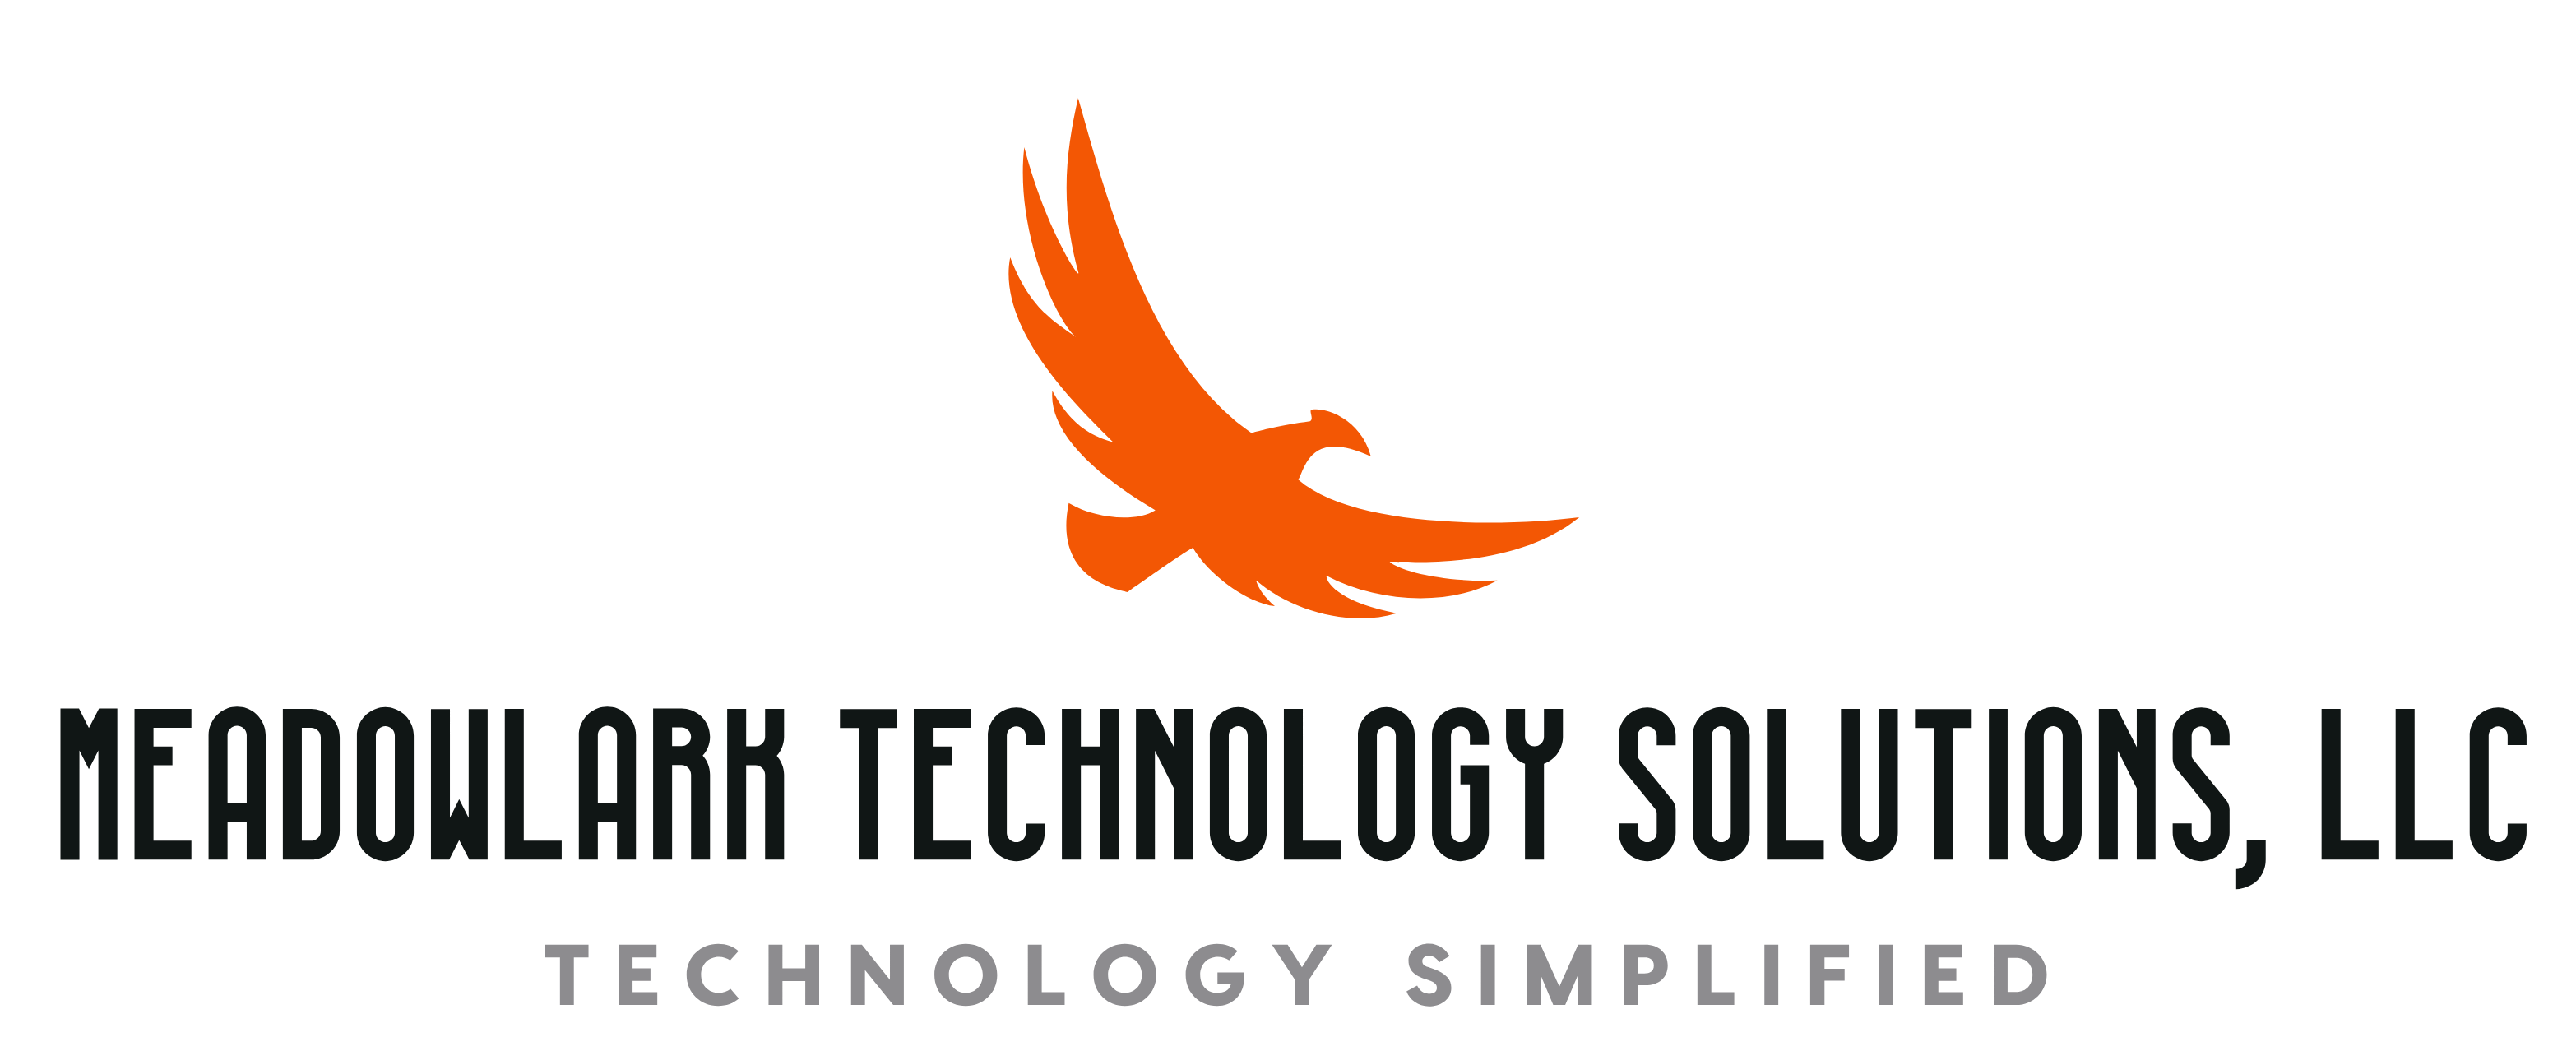 Meadowlark Technology Solutions